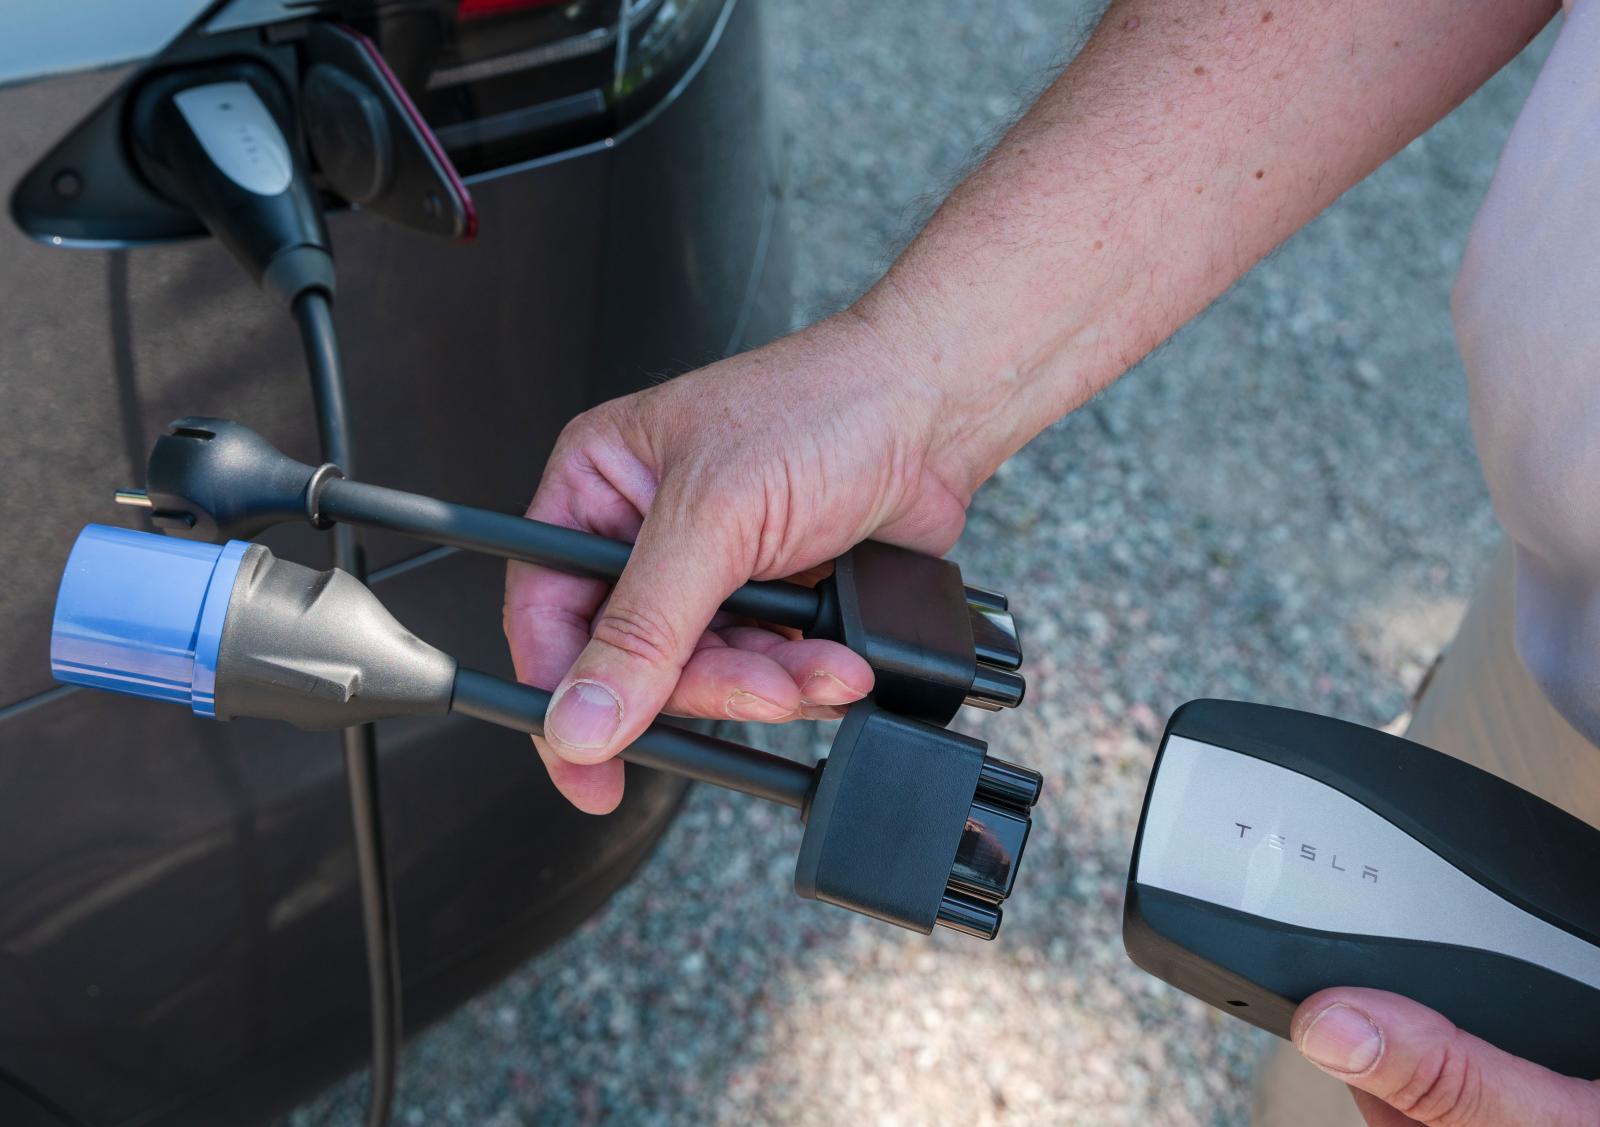 Olika laddstationer har olika anslutningar. Högst kapacitet finns i Teslas Superchargers.